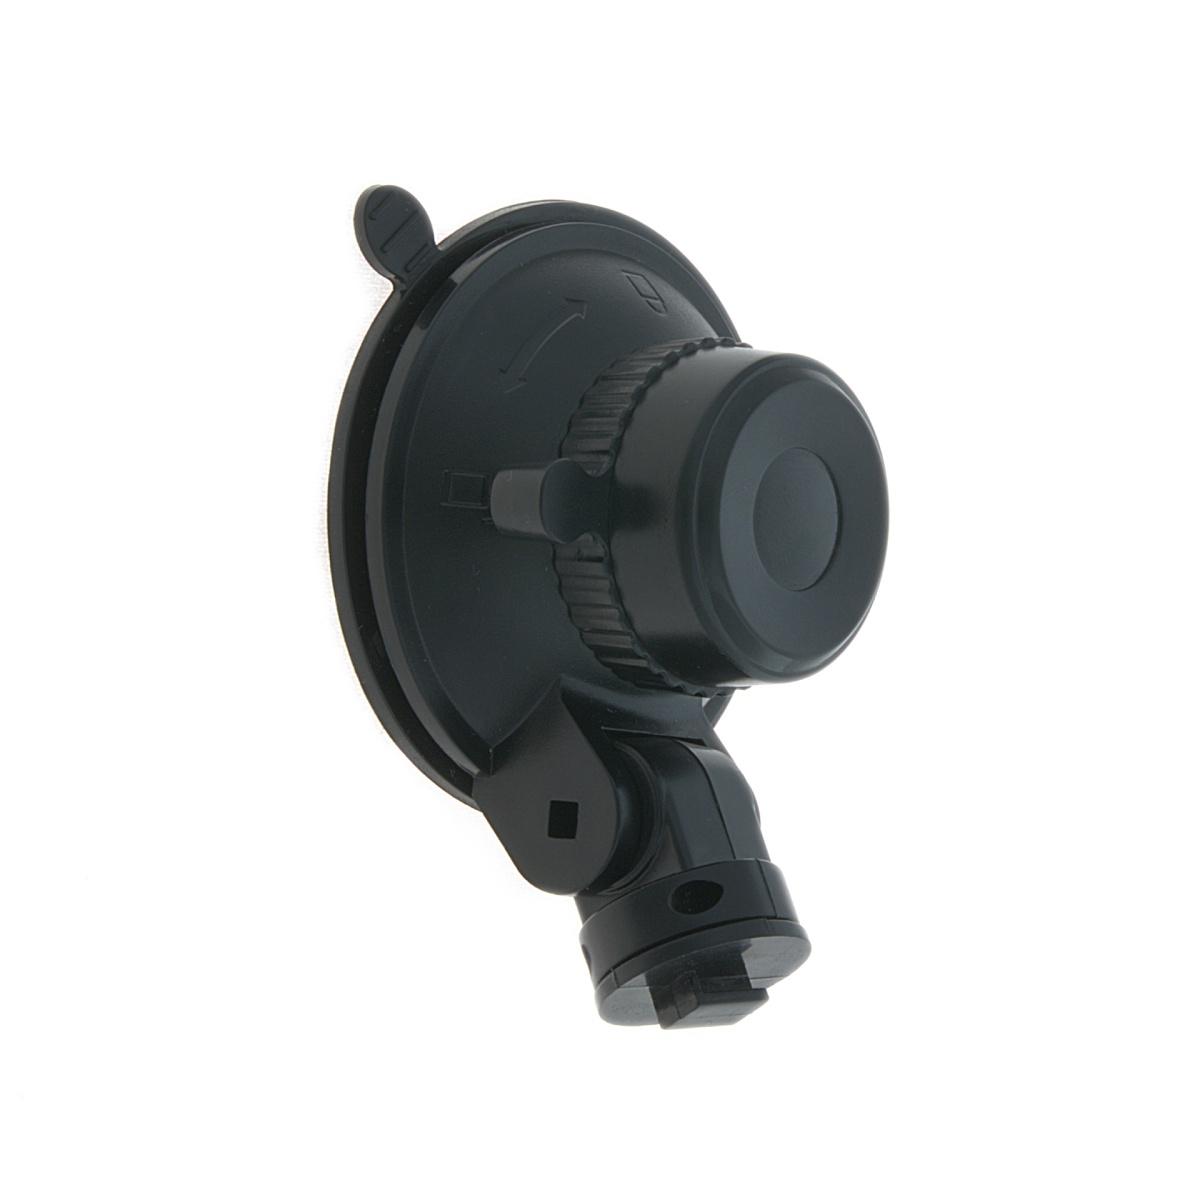 LAMAX C6 Suction Holder